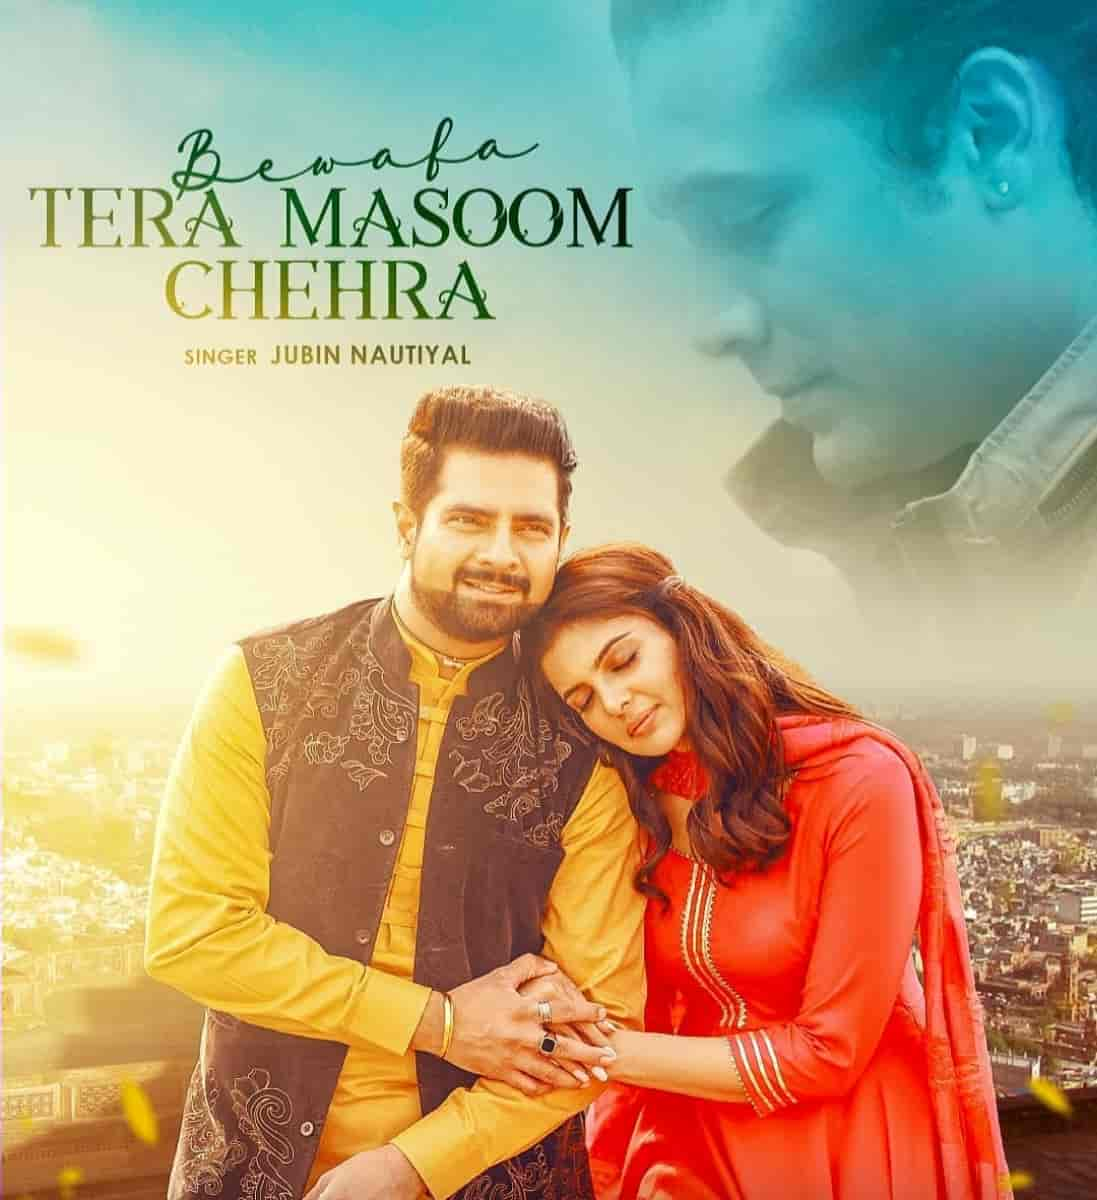 A very talented artist Jubin Nautiyal back again with a another beautiful recreated hindi song which is titled Bewafa Tera Masoom Chehra.